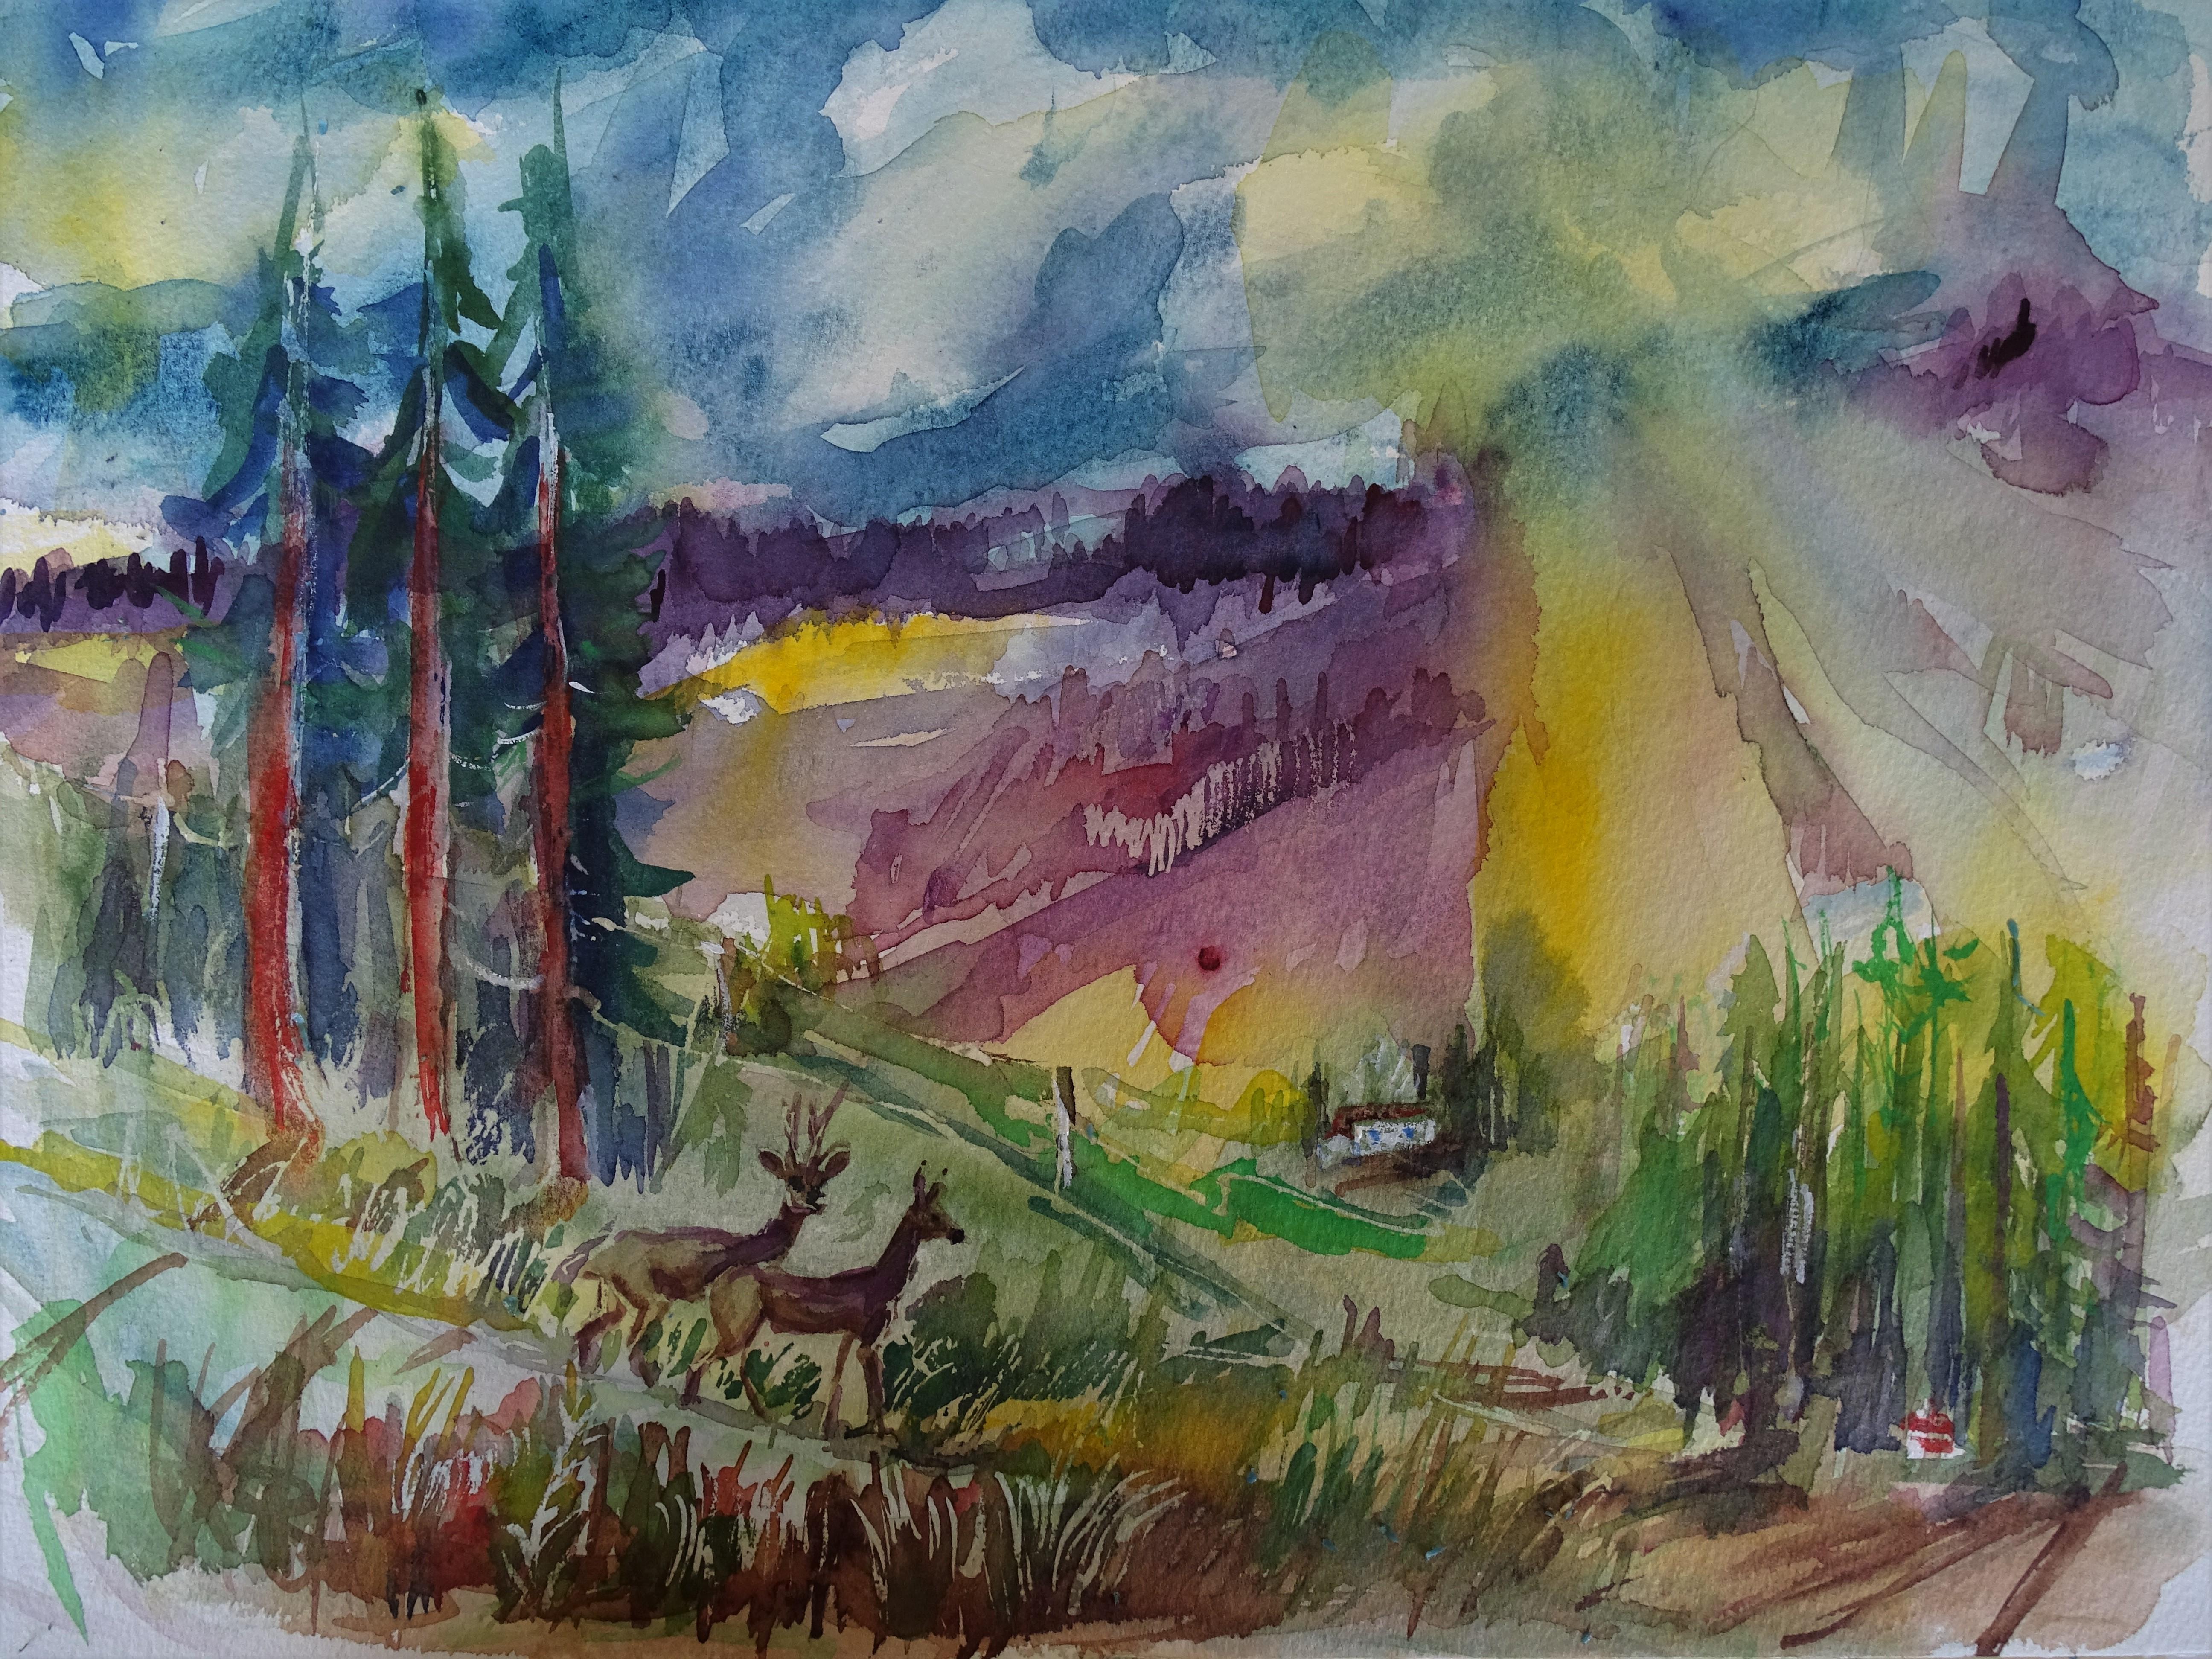 2-Bayerischer-Wald-Aquarelle-Nadia-Baumgart